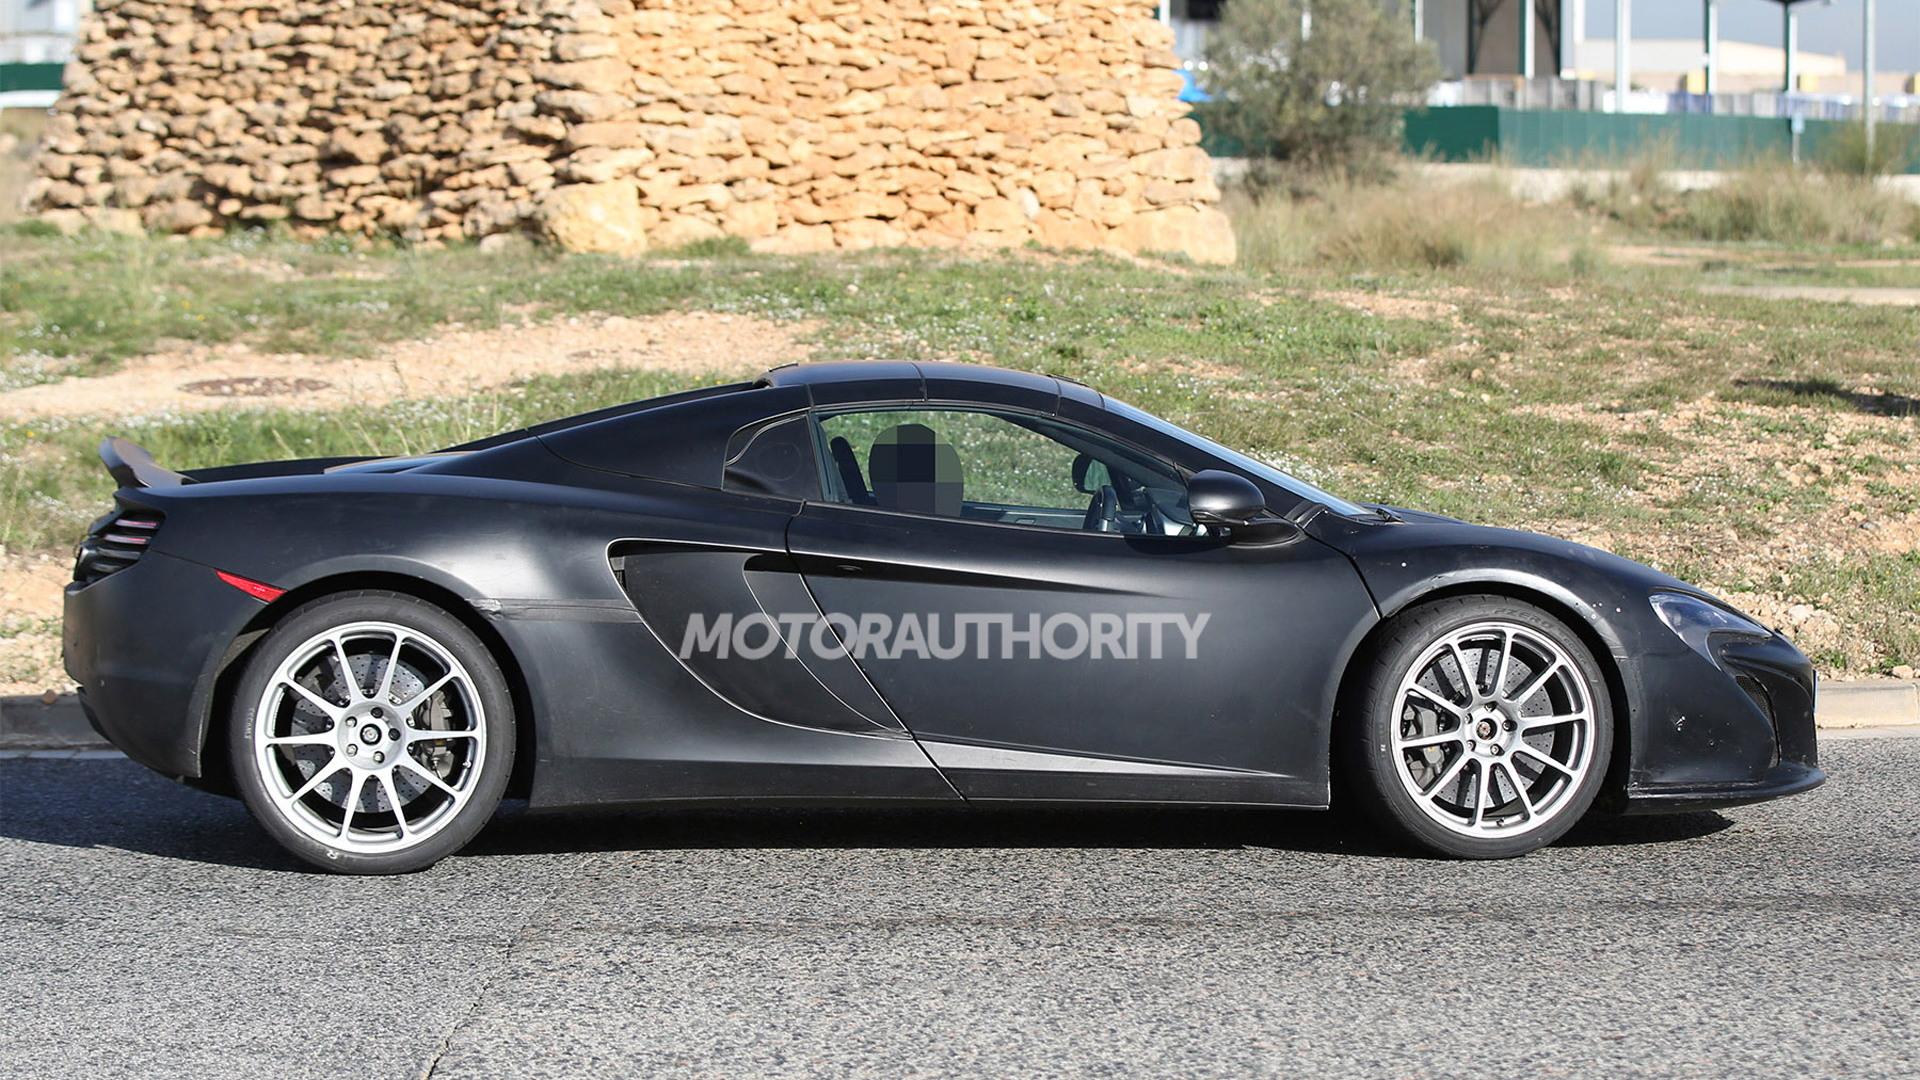 McLaren 675LT Spider test mule spy shots - Image via S. Baldauf/SB-Medien